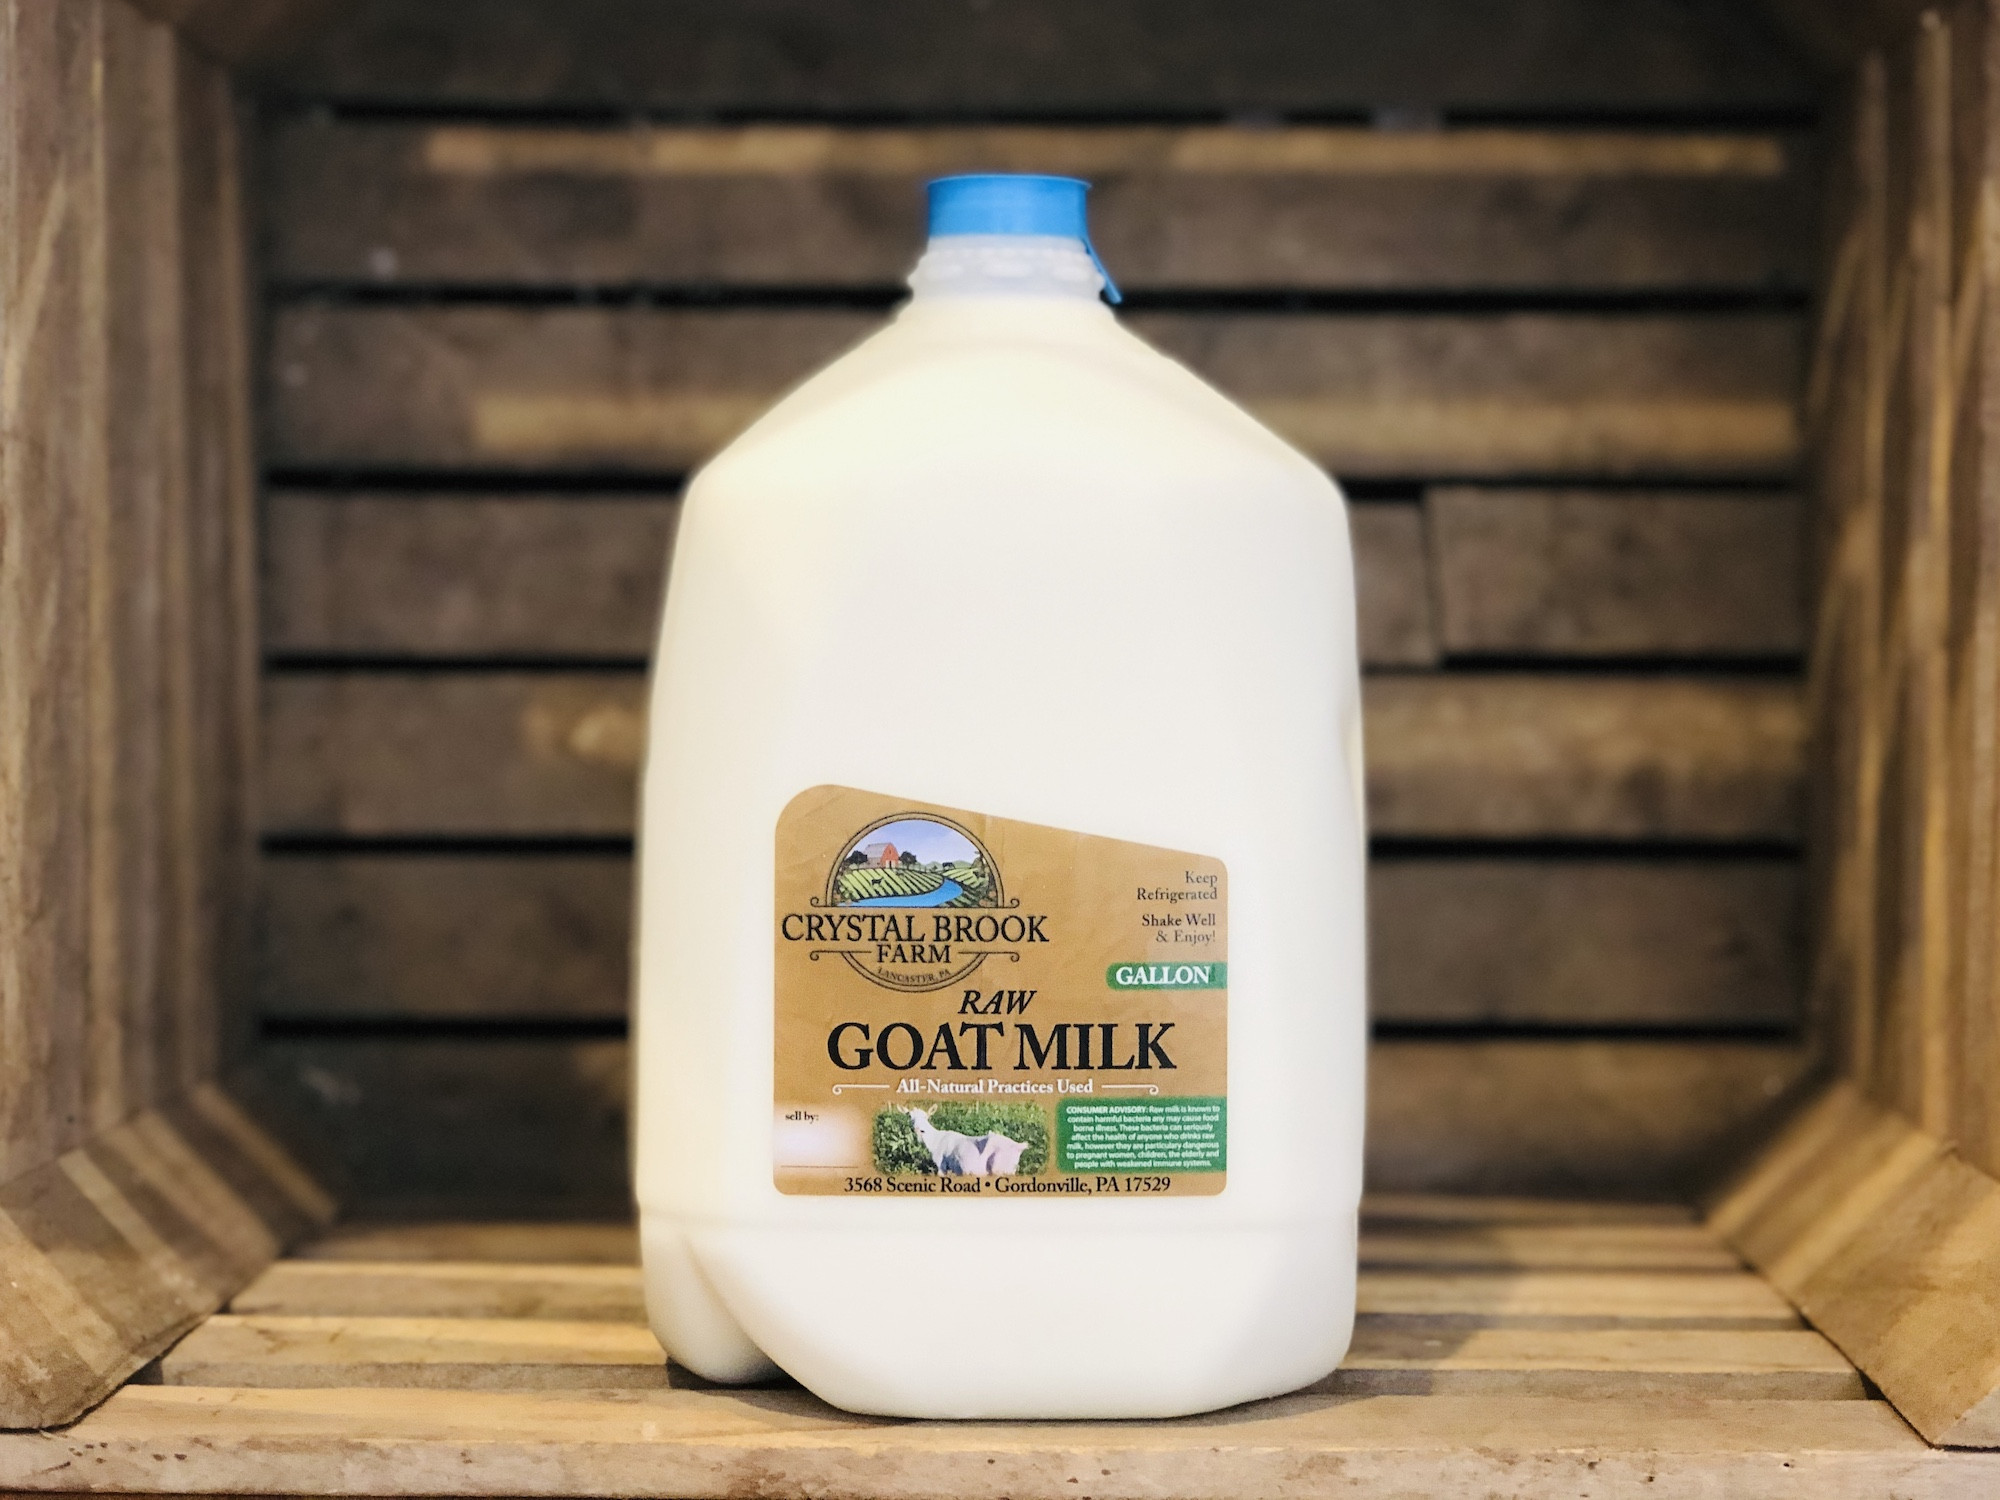 Goat Milk, 1 gallon